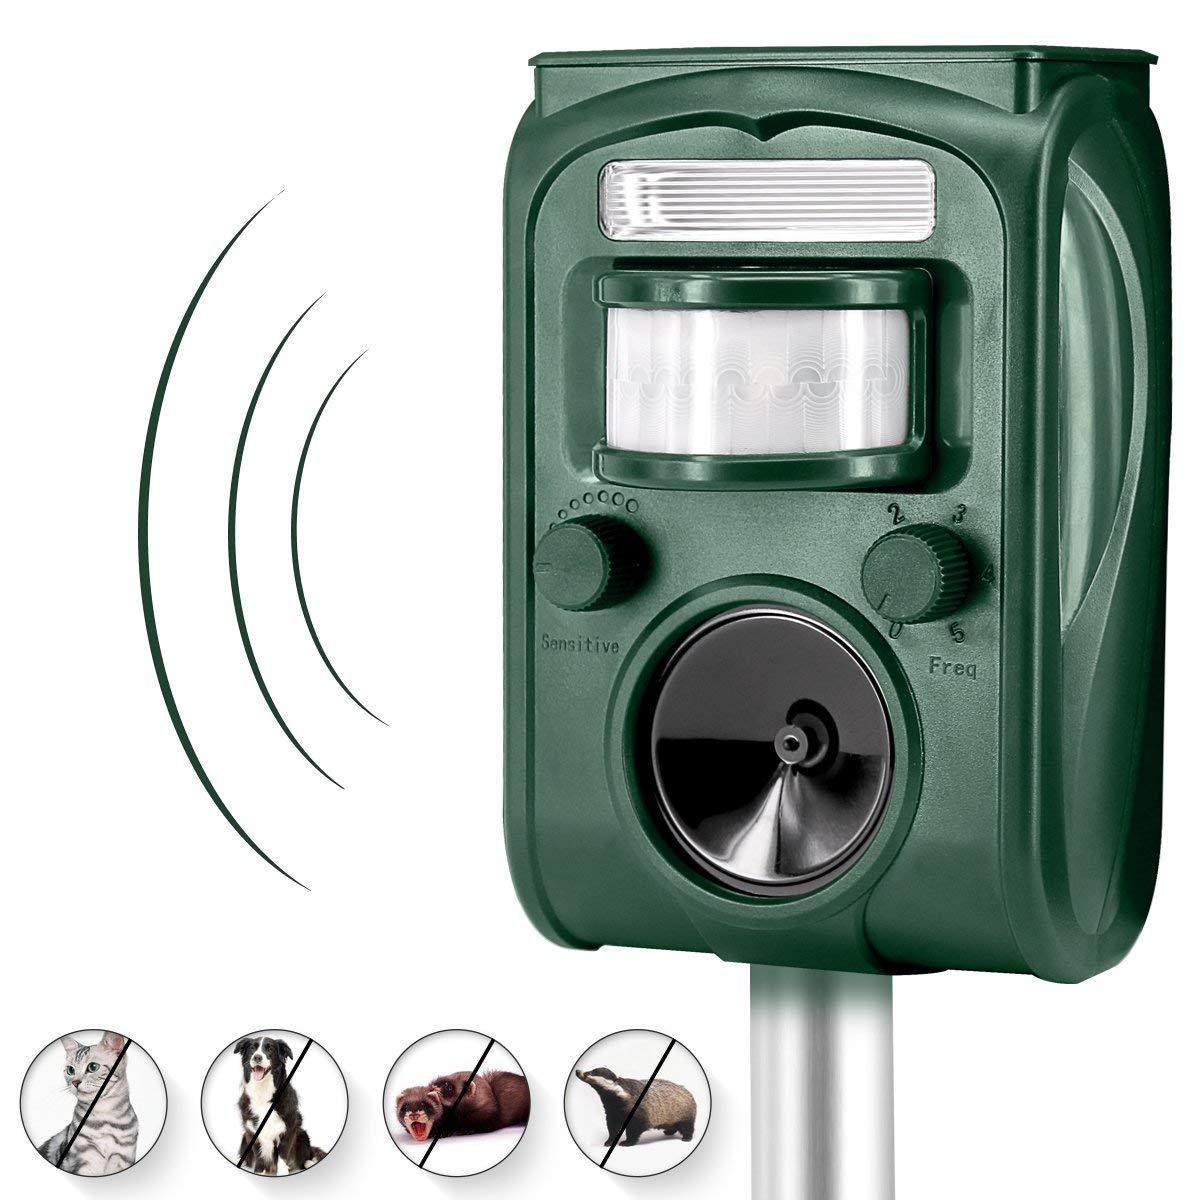 Outdoor Waterproof Ultrasonic Animal Repeller, Solar Powered & USB Charging, Divo Pet Repellent Cat Dog Mice Bird Deterrent Spike For Garden Yard Field Farm Glassland With Infrared Sensor, Green